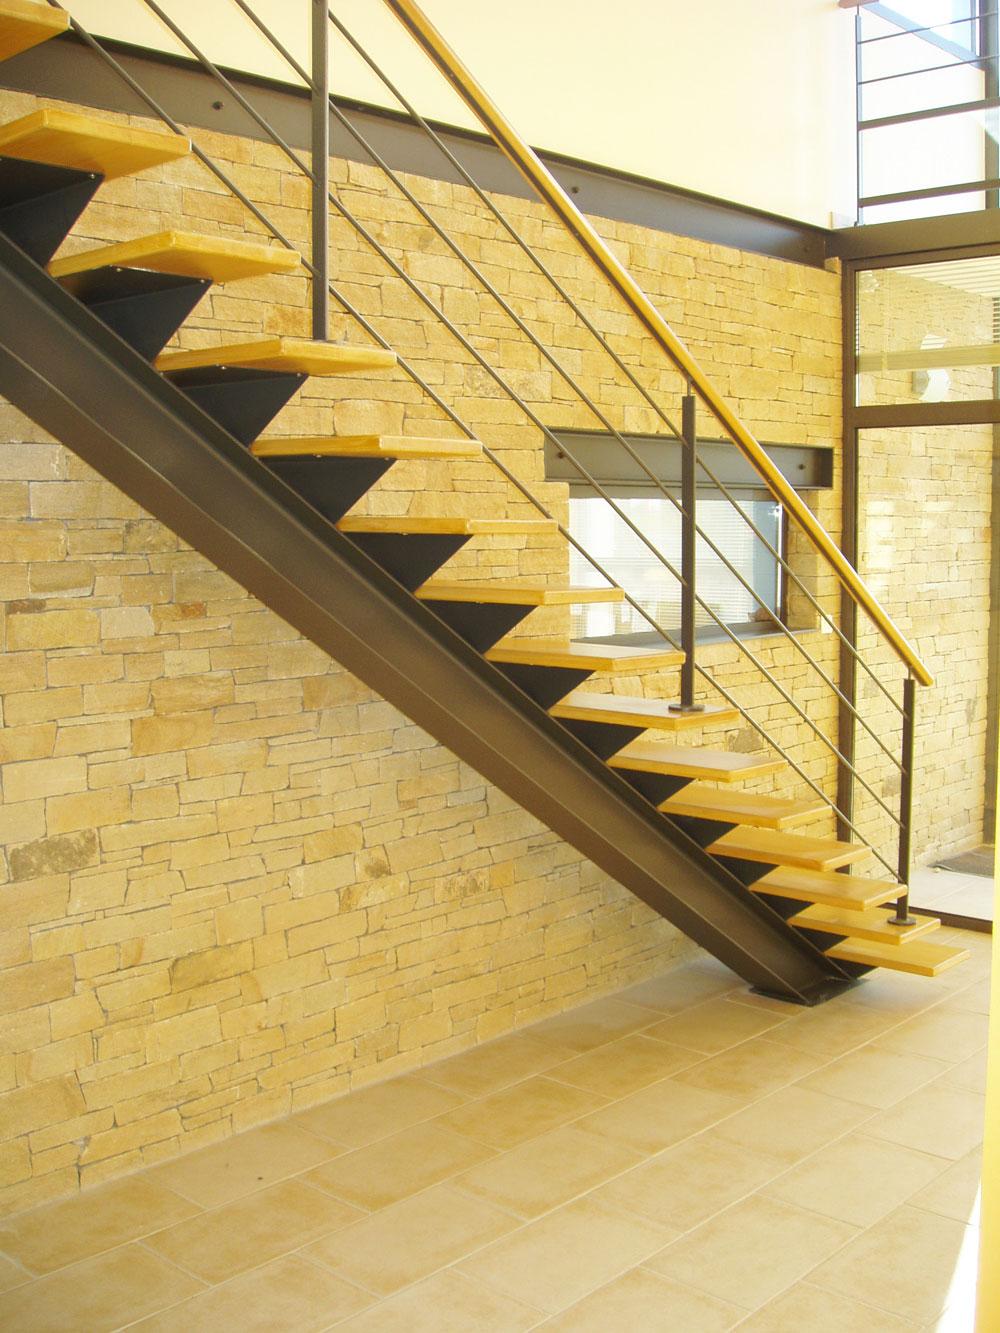 thiebault menuiserie escalier bois metal etrelles ffb vitr. Black Bedroom Furniture Sets. Home Design Ideas